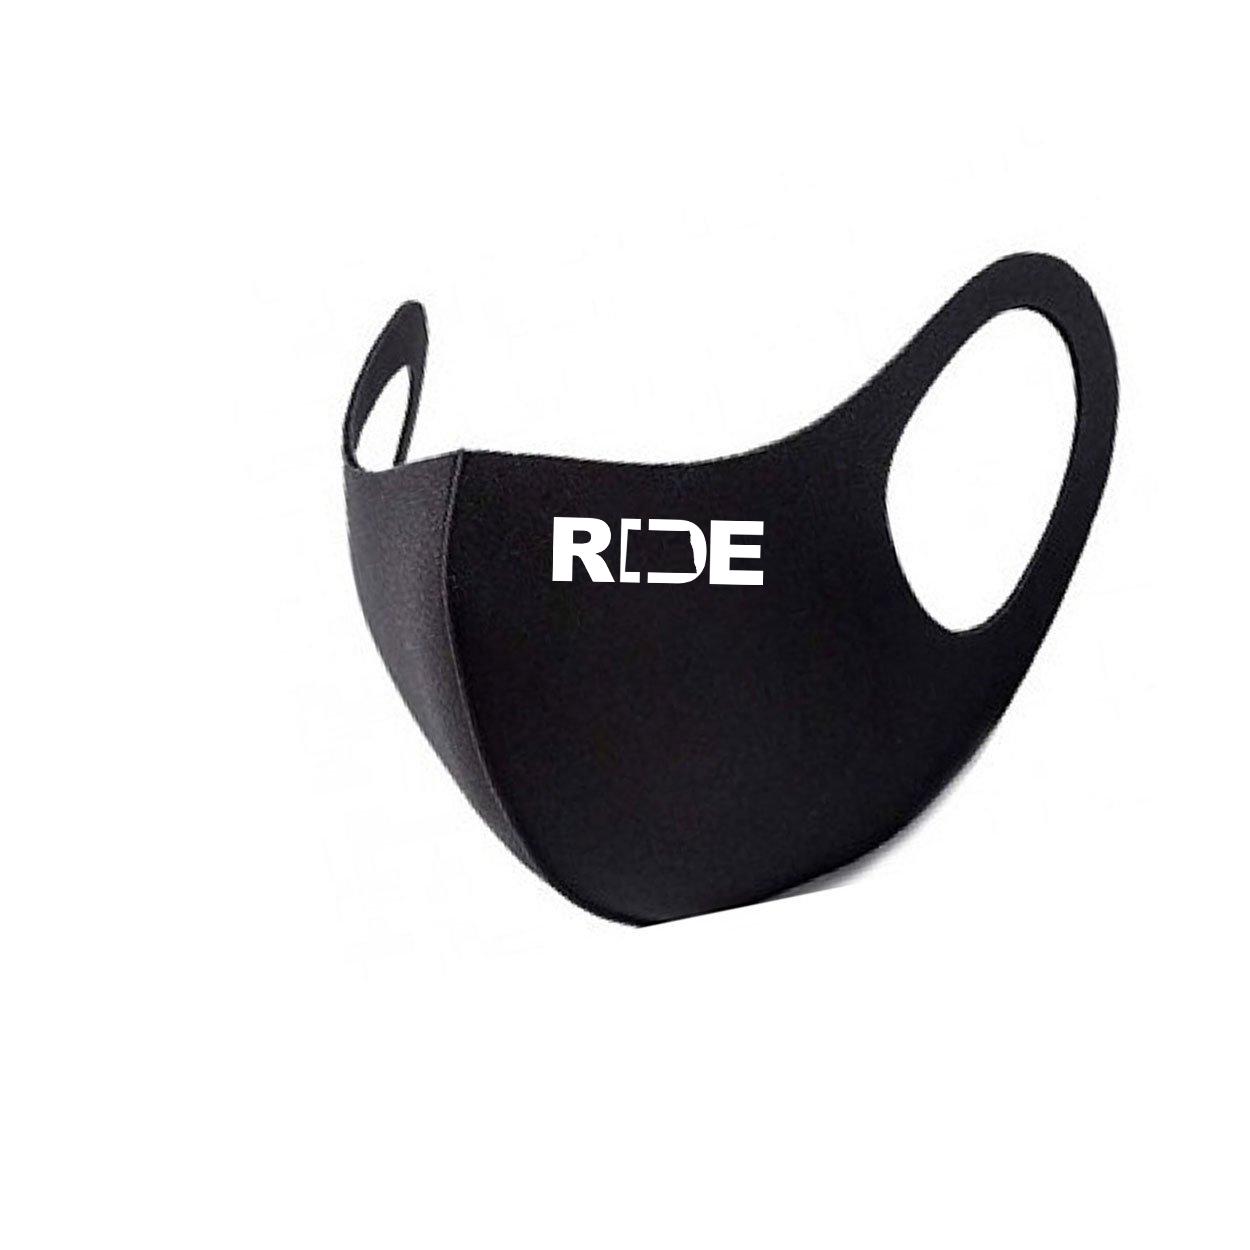 Ride North Dakota Night Out Fitted Washable Face Mask Black (White Logo)